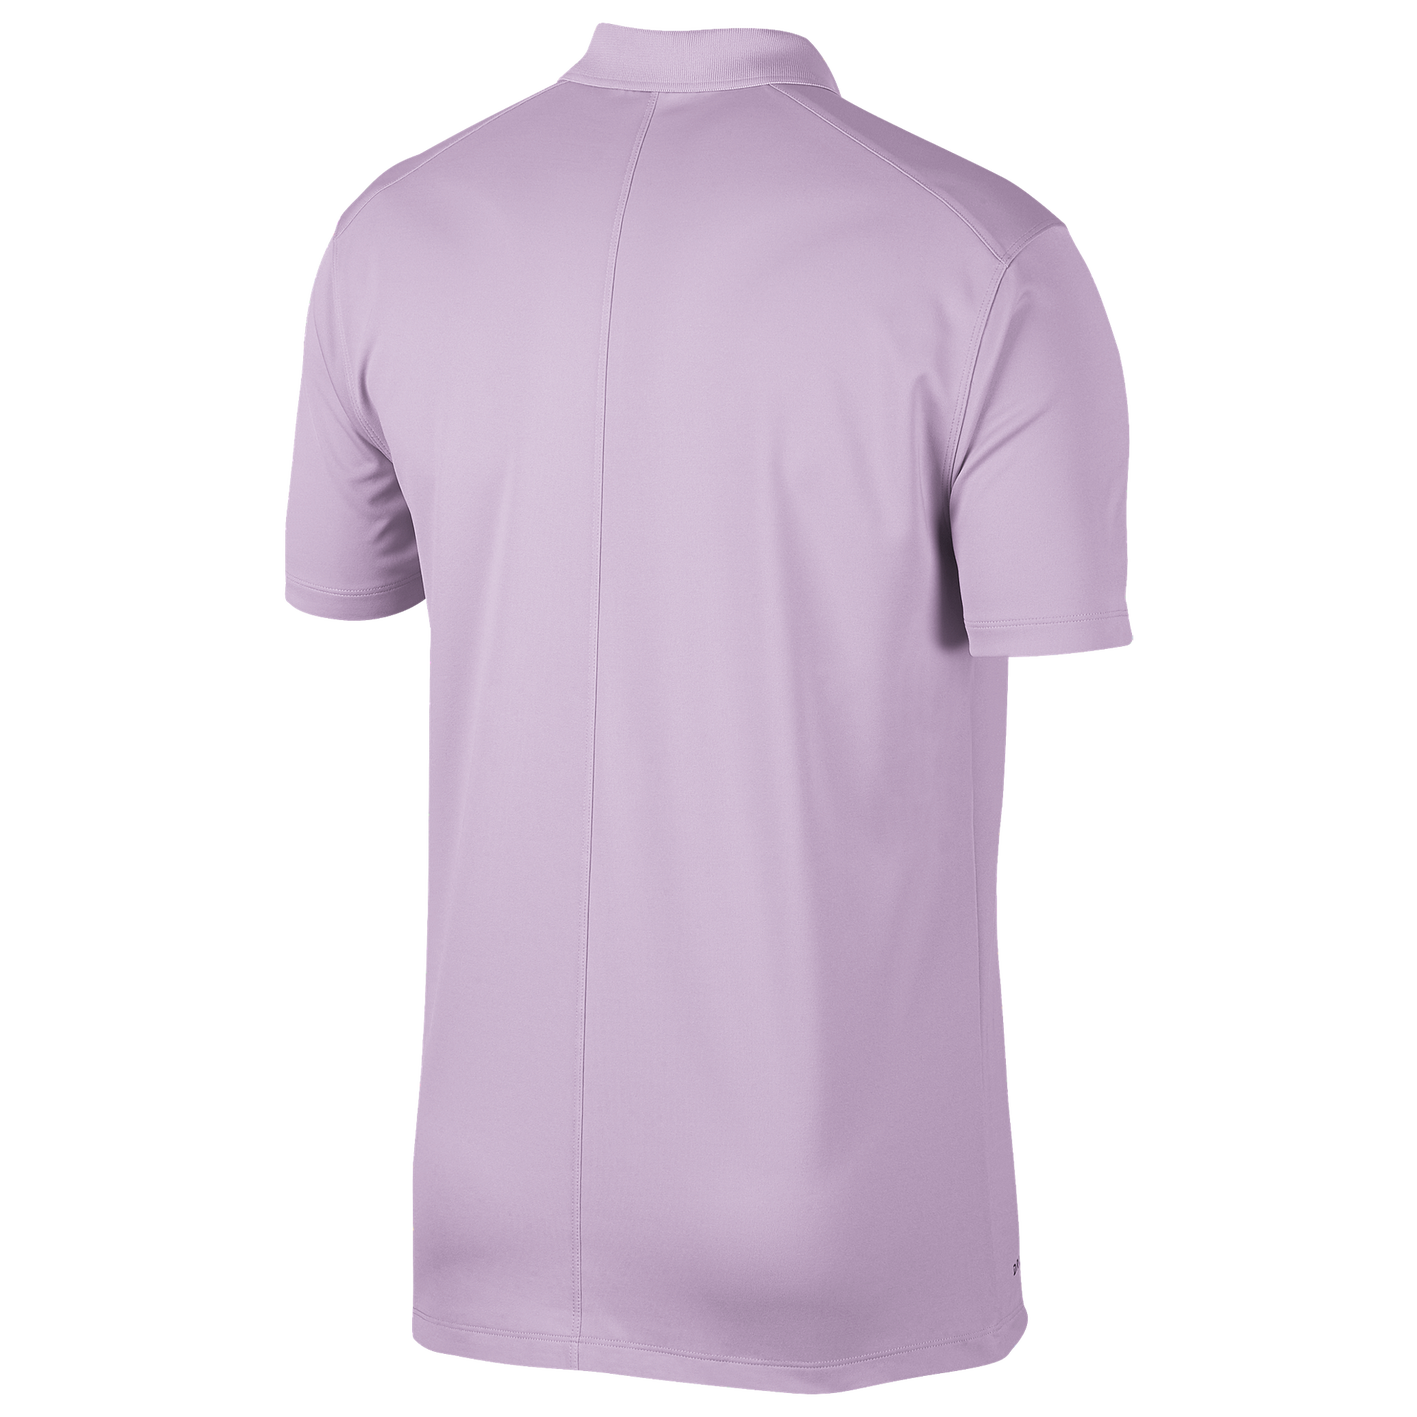 dbc0ef4f Nike Dri-Fit Victory Solid Golf Polo - Men's - Golf - Clothing ...